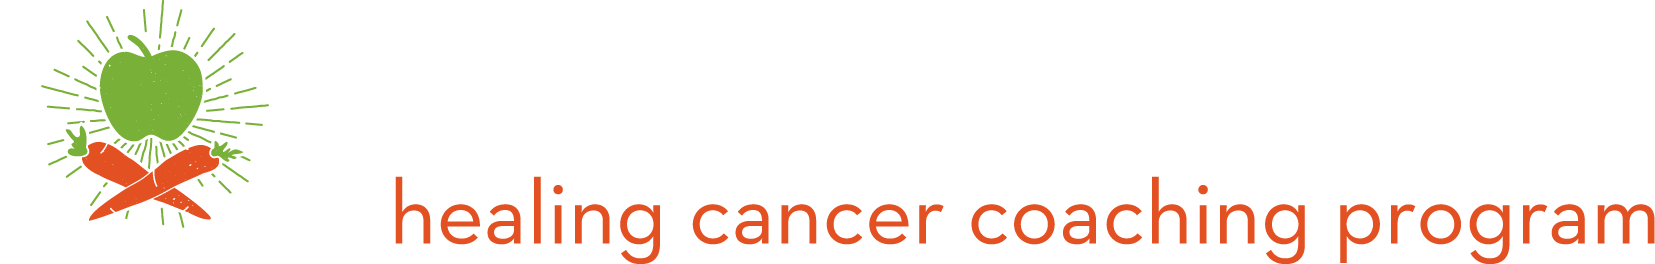 SQUARE ONE Healing Cancer Coaching Program